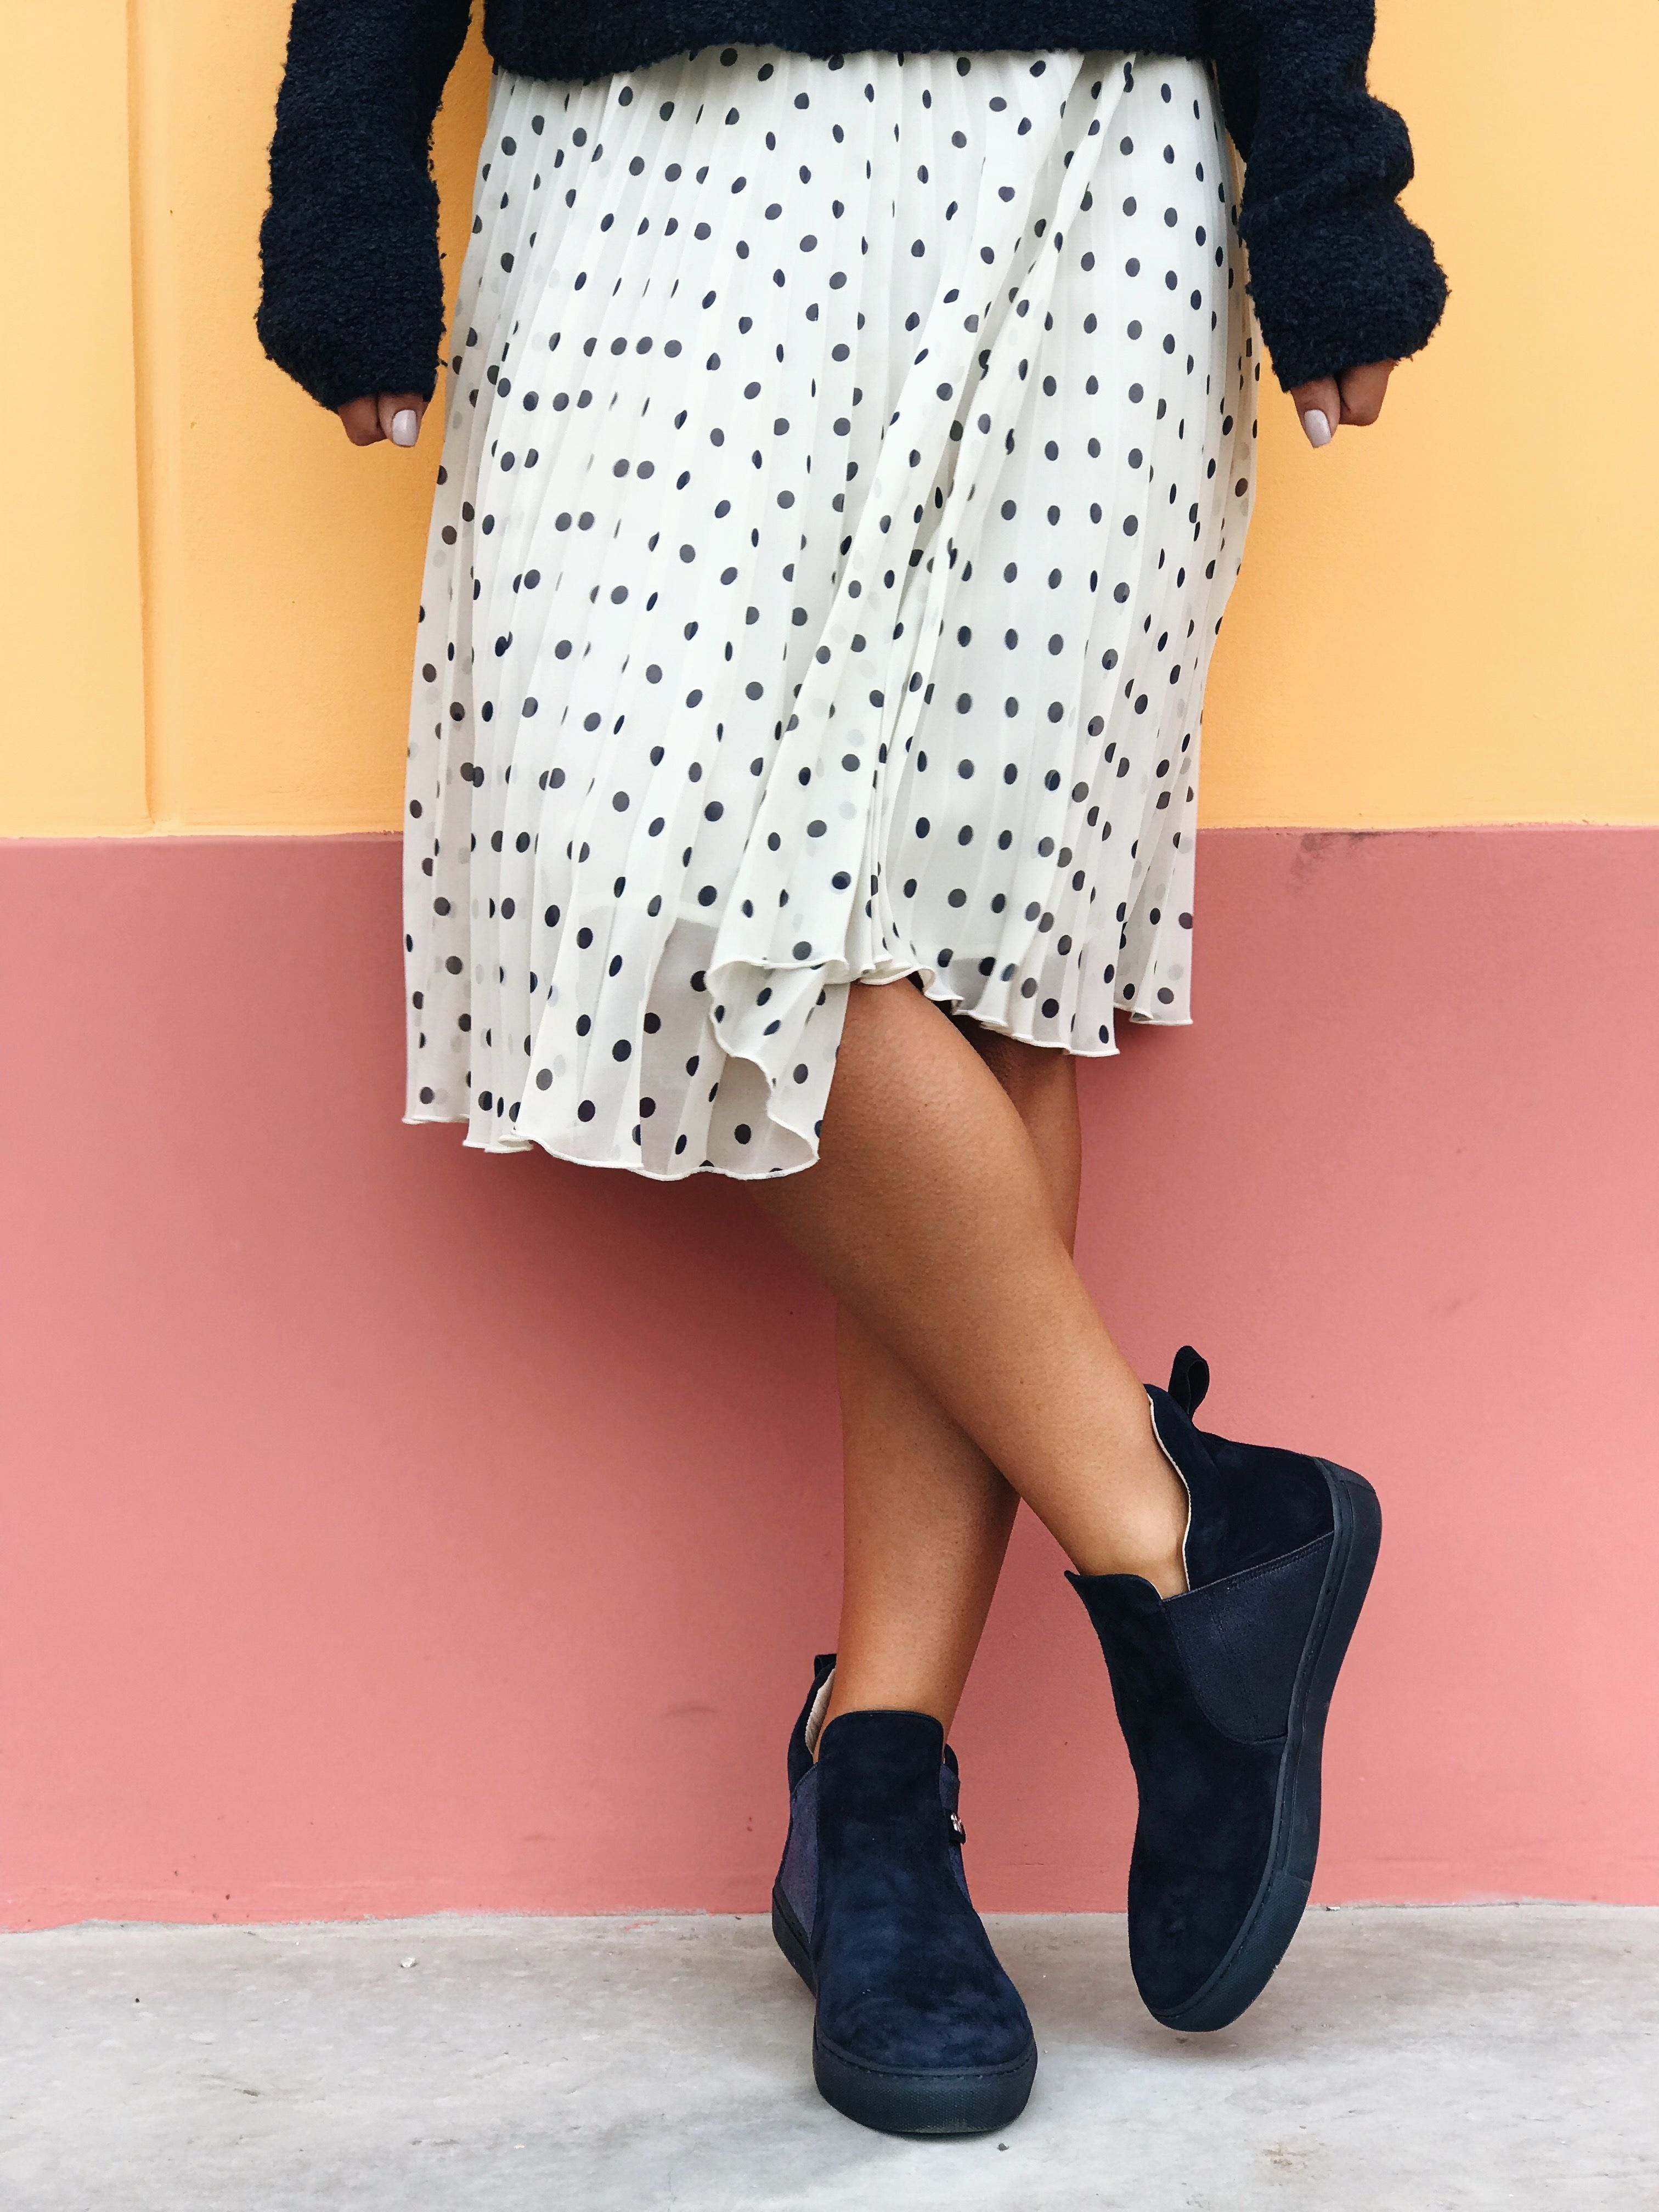 Womens Chelsea Boots Made Of Suede Zhenskie Botinki Chelsi Iz Zamshi